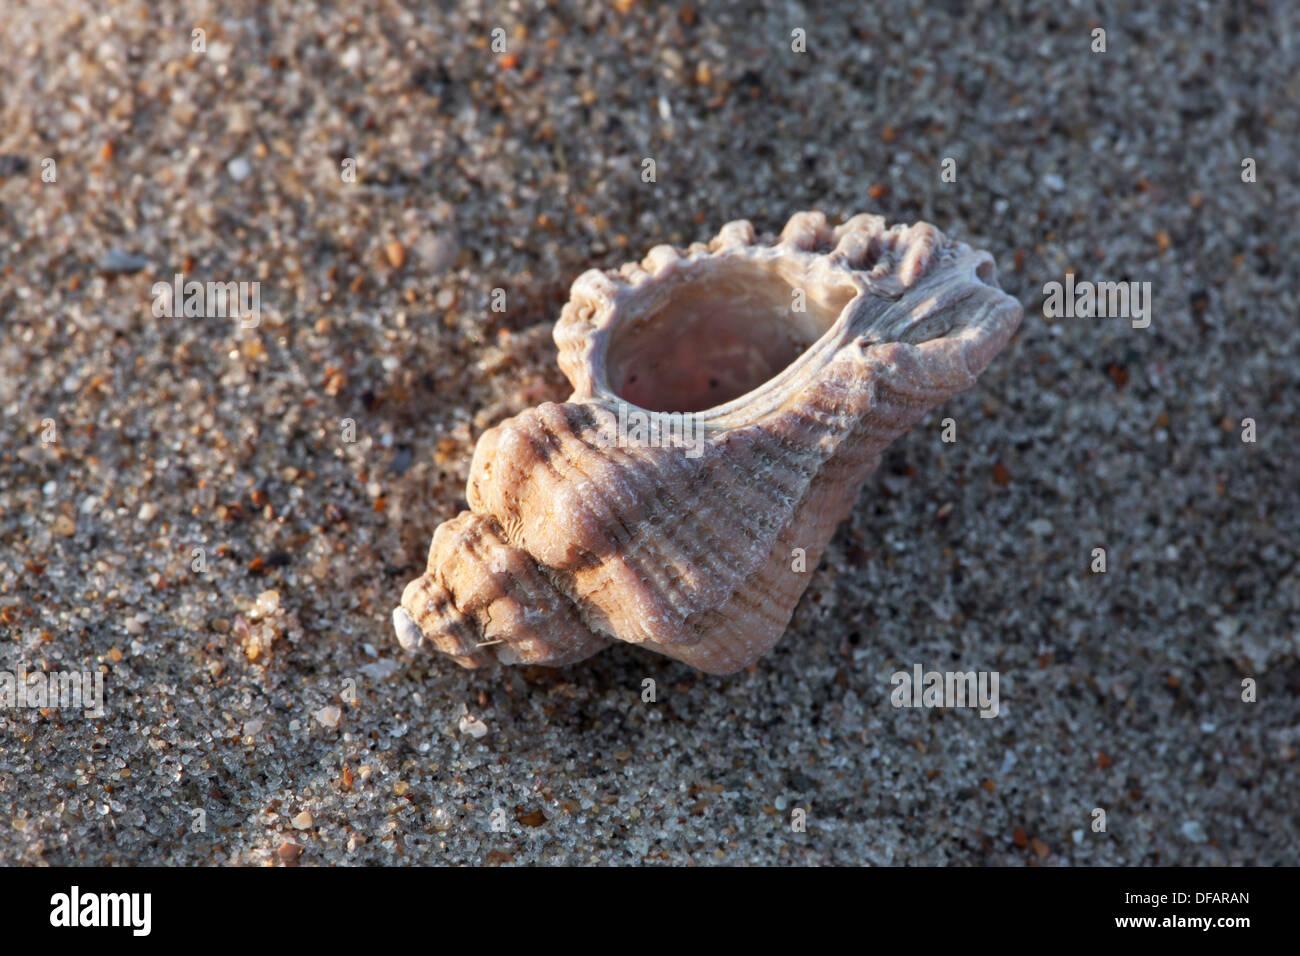 European sting winkle / Oyster drill / Hedgehog Murex (Ocenebra erinacea) on beach along the North Sea coast - Stock Image